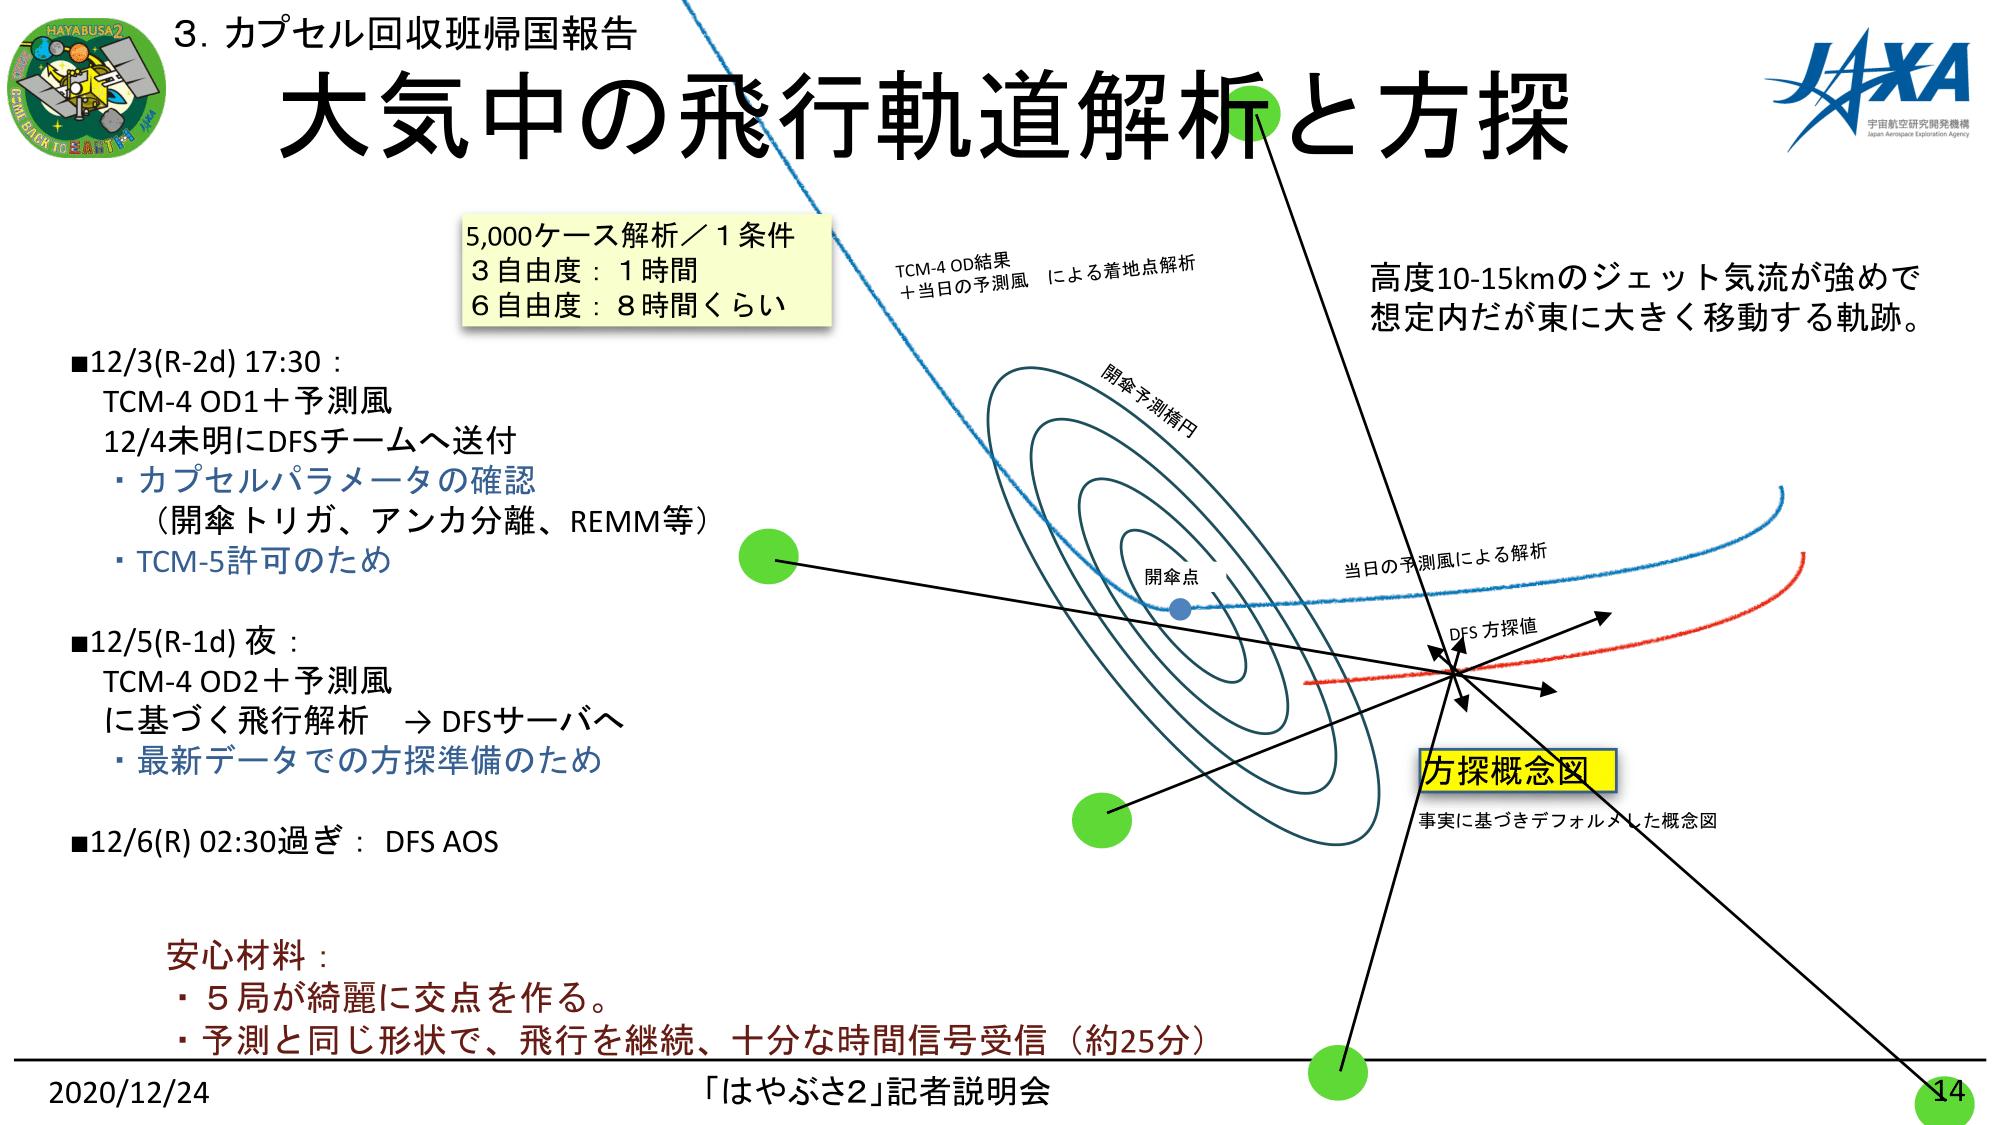 f:id:Imamura:20201224135120p:plain